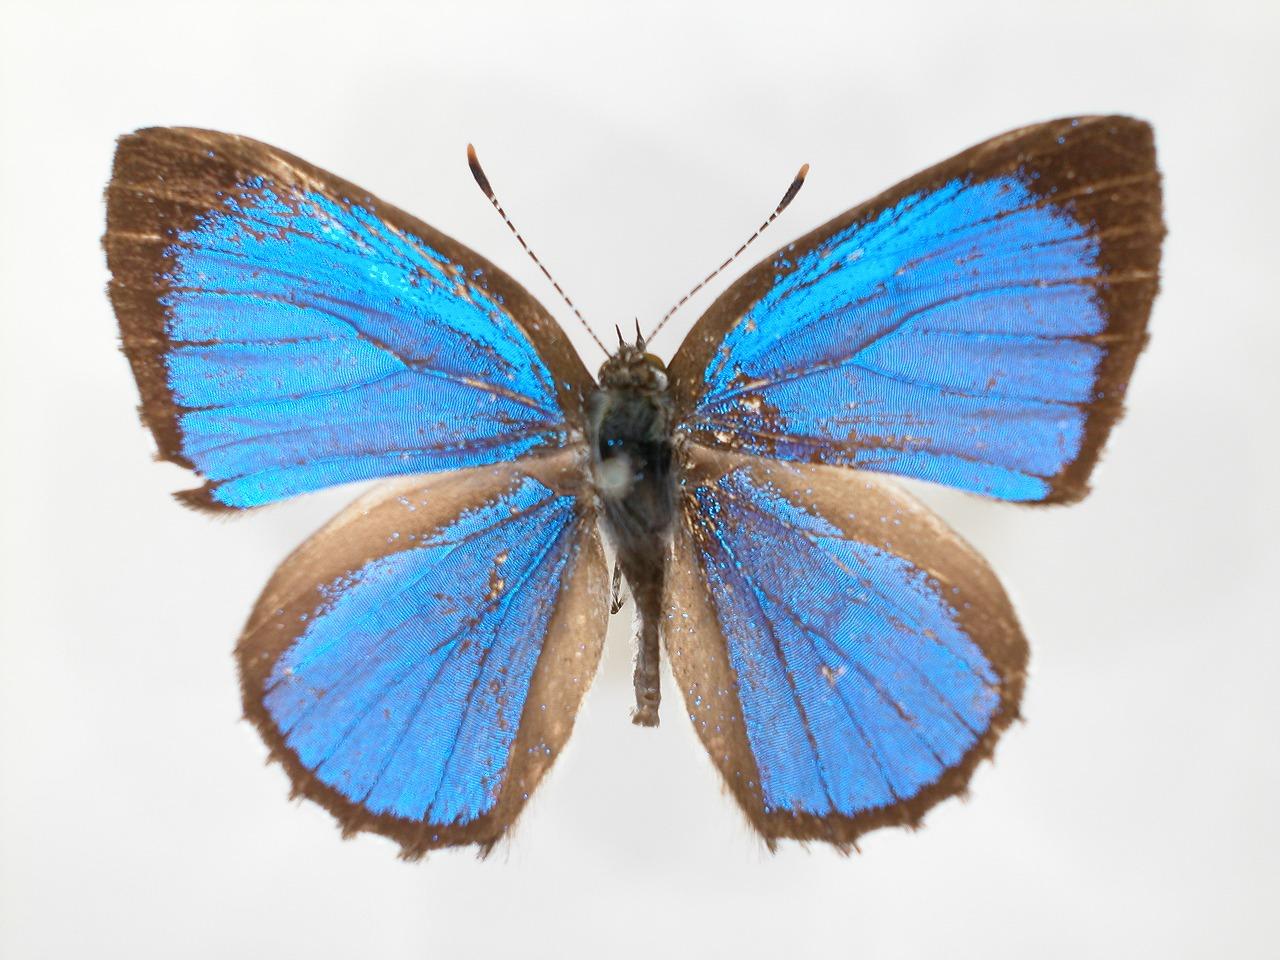 https://www.hitohaku.jp/material/l-material/butterfly-wing/5-lycaenidae/B1-273183_A.jpg